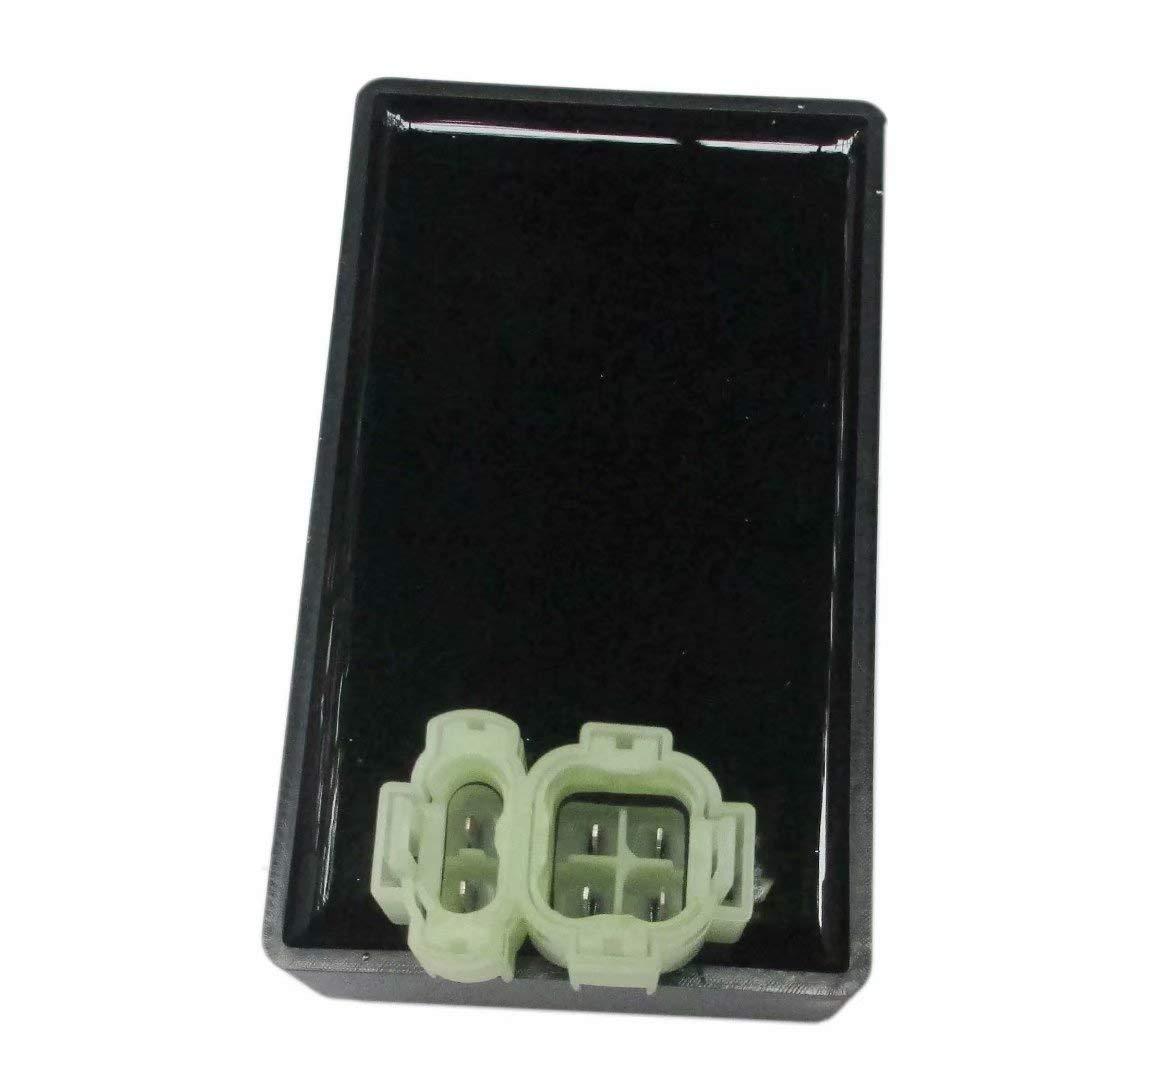 CDI BOX Module Fits Honda Atv 300 Trx300 Trx300Fw Fw 94 95 96 97 1994 1995 1996 1997 ESP1540 Repl OE#30410-HM5-505 30410-HM5-672 49-5284